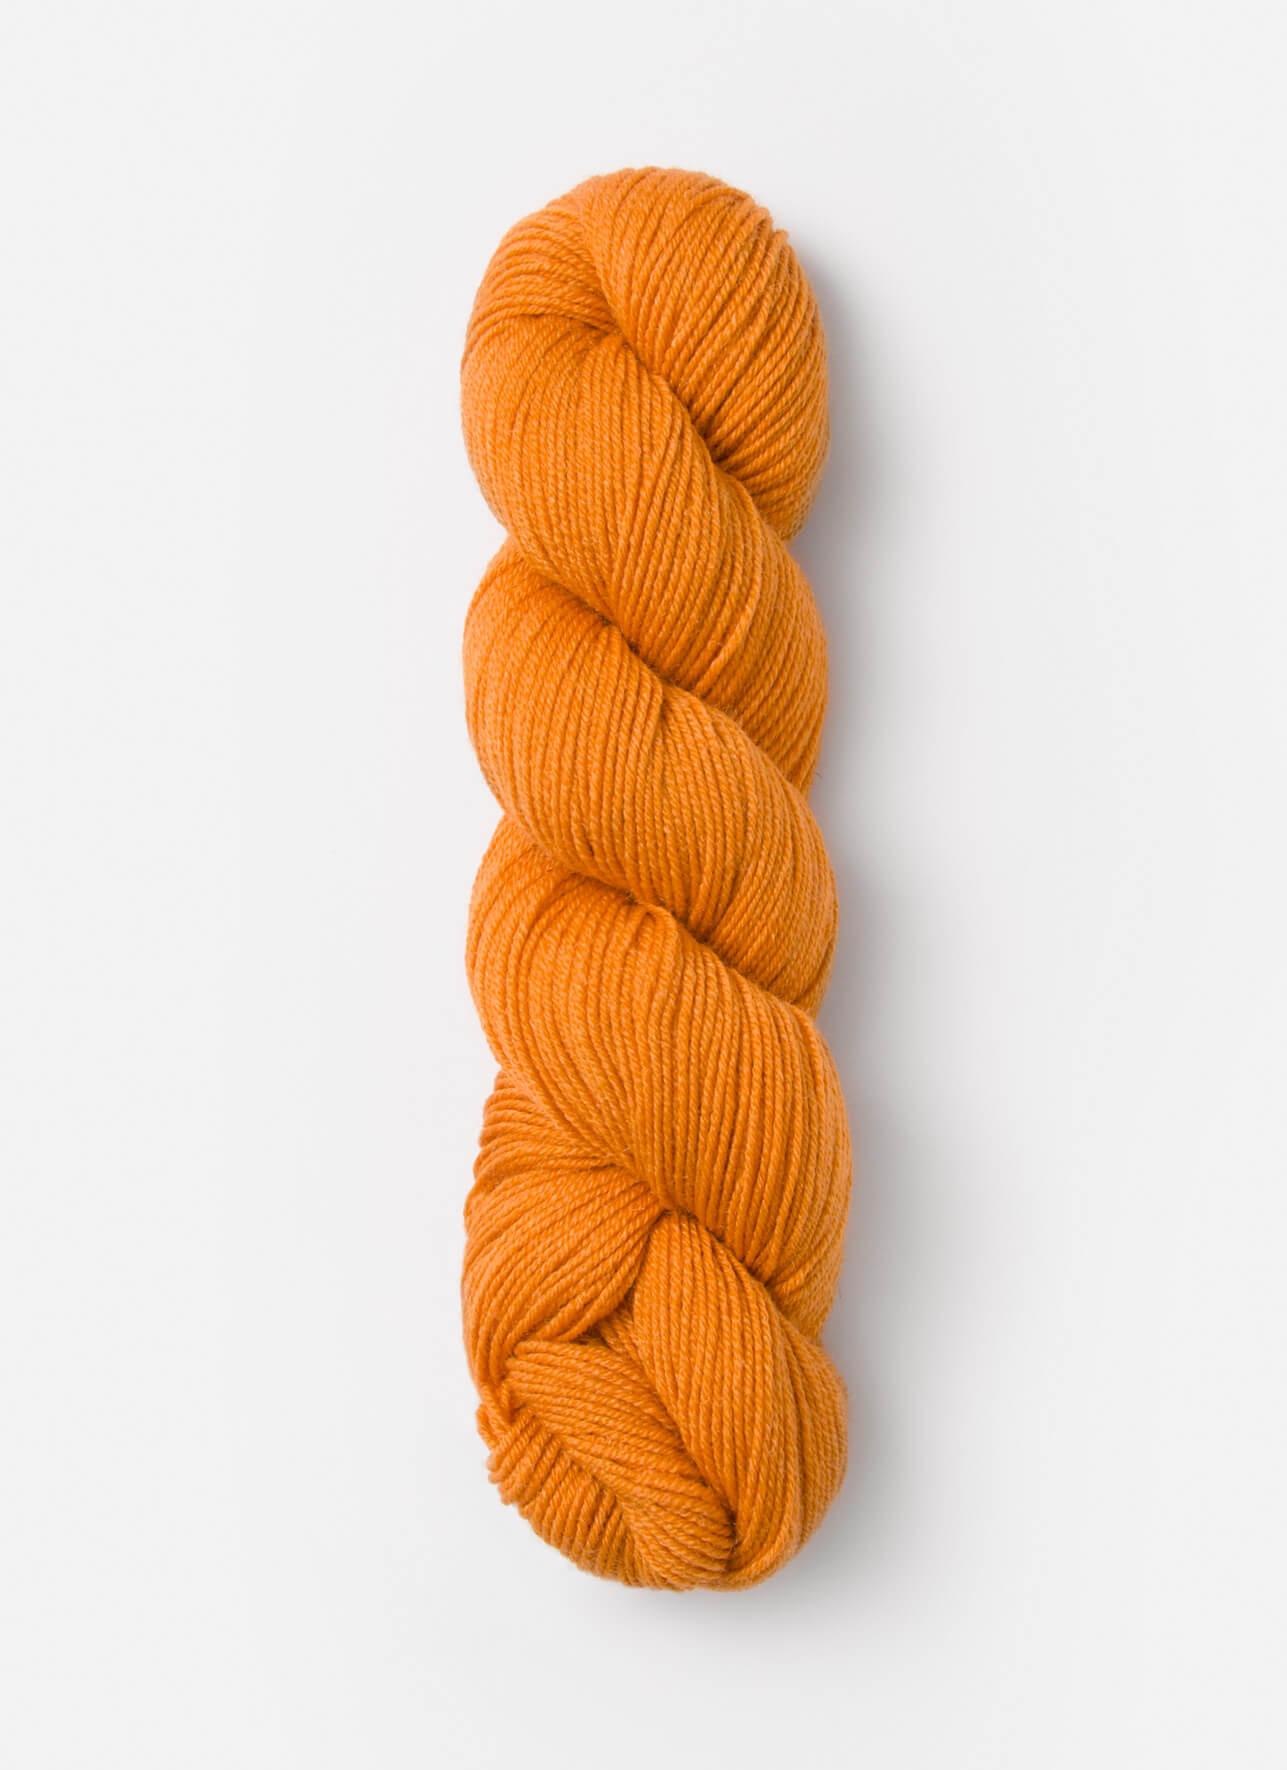 No. 7817: Goldfish